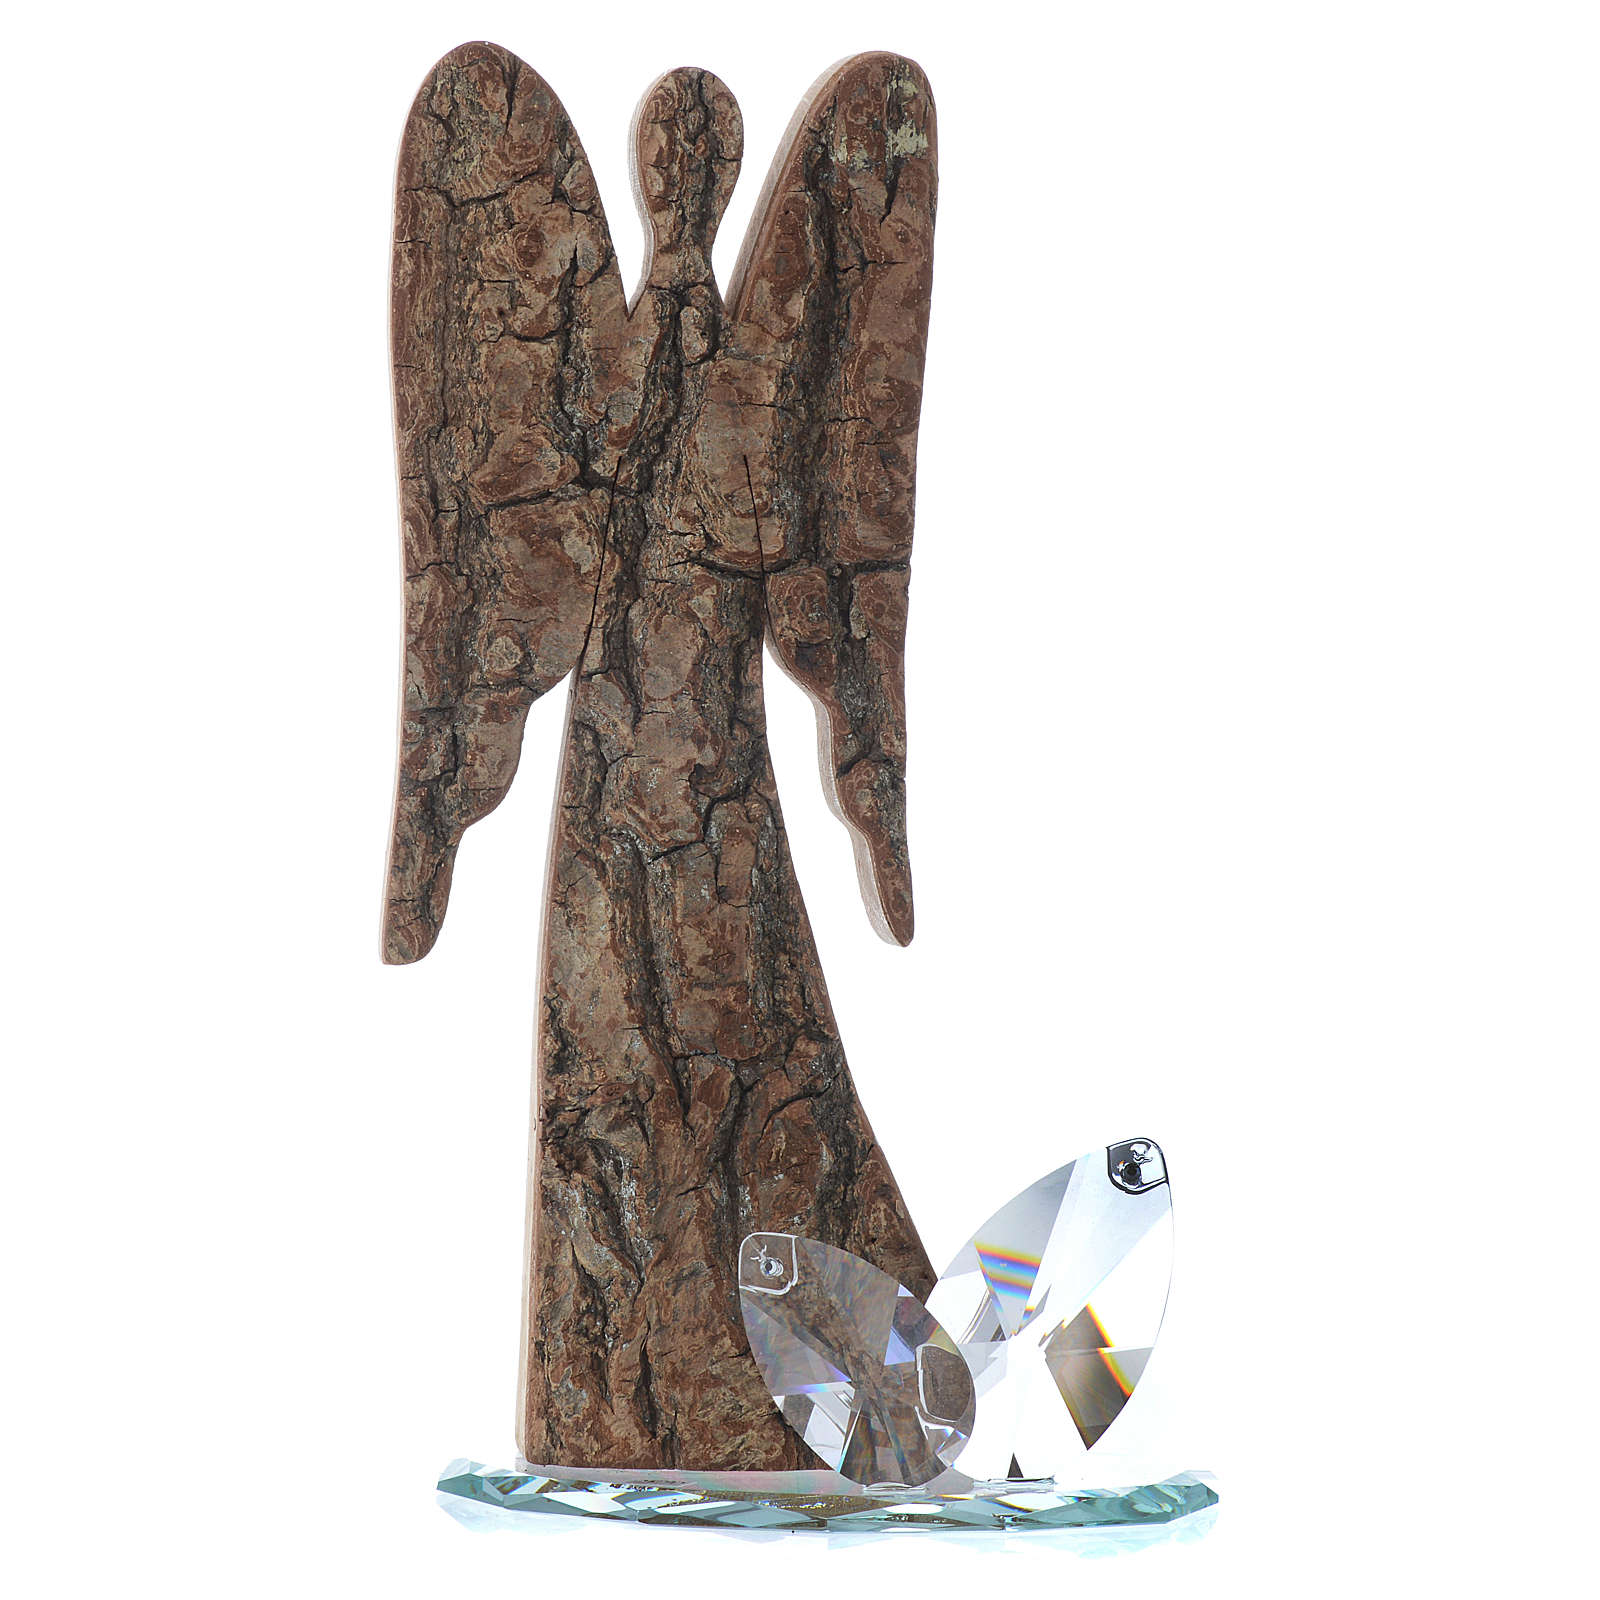 Imagen Ángel en Madera y base en cristal h.26 cm 3